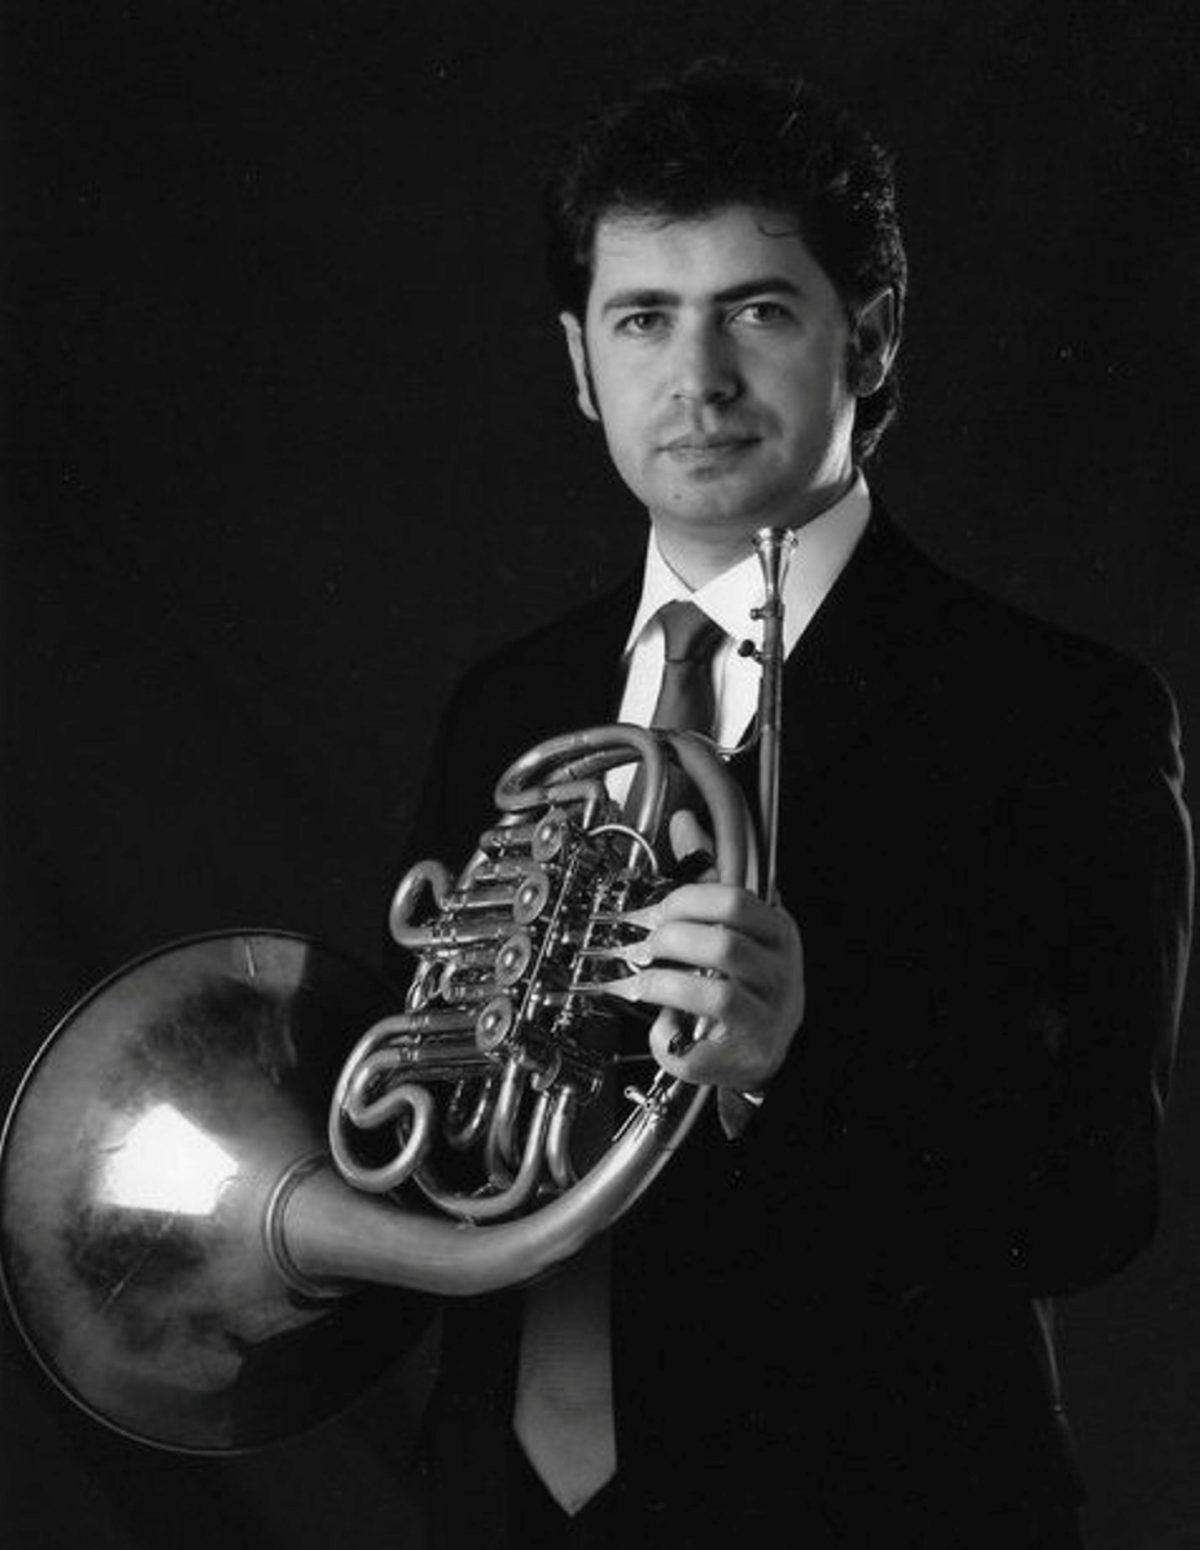 Alessandro Monticelli